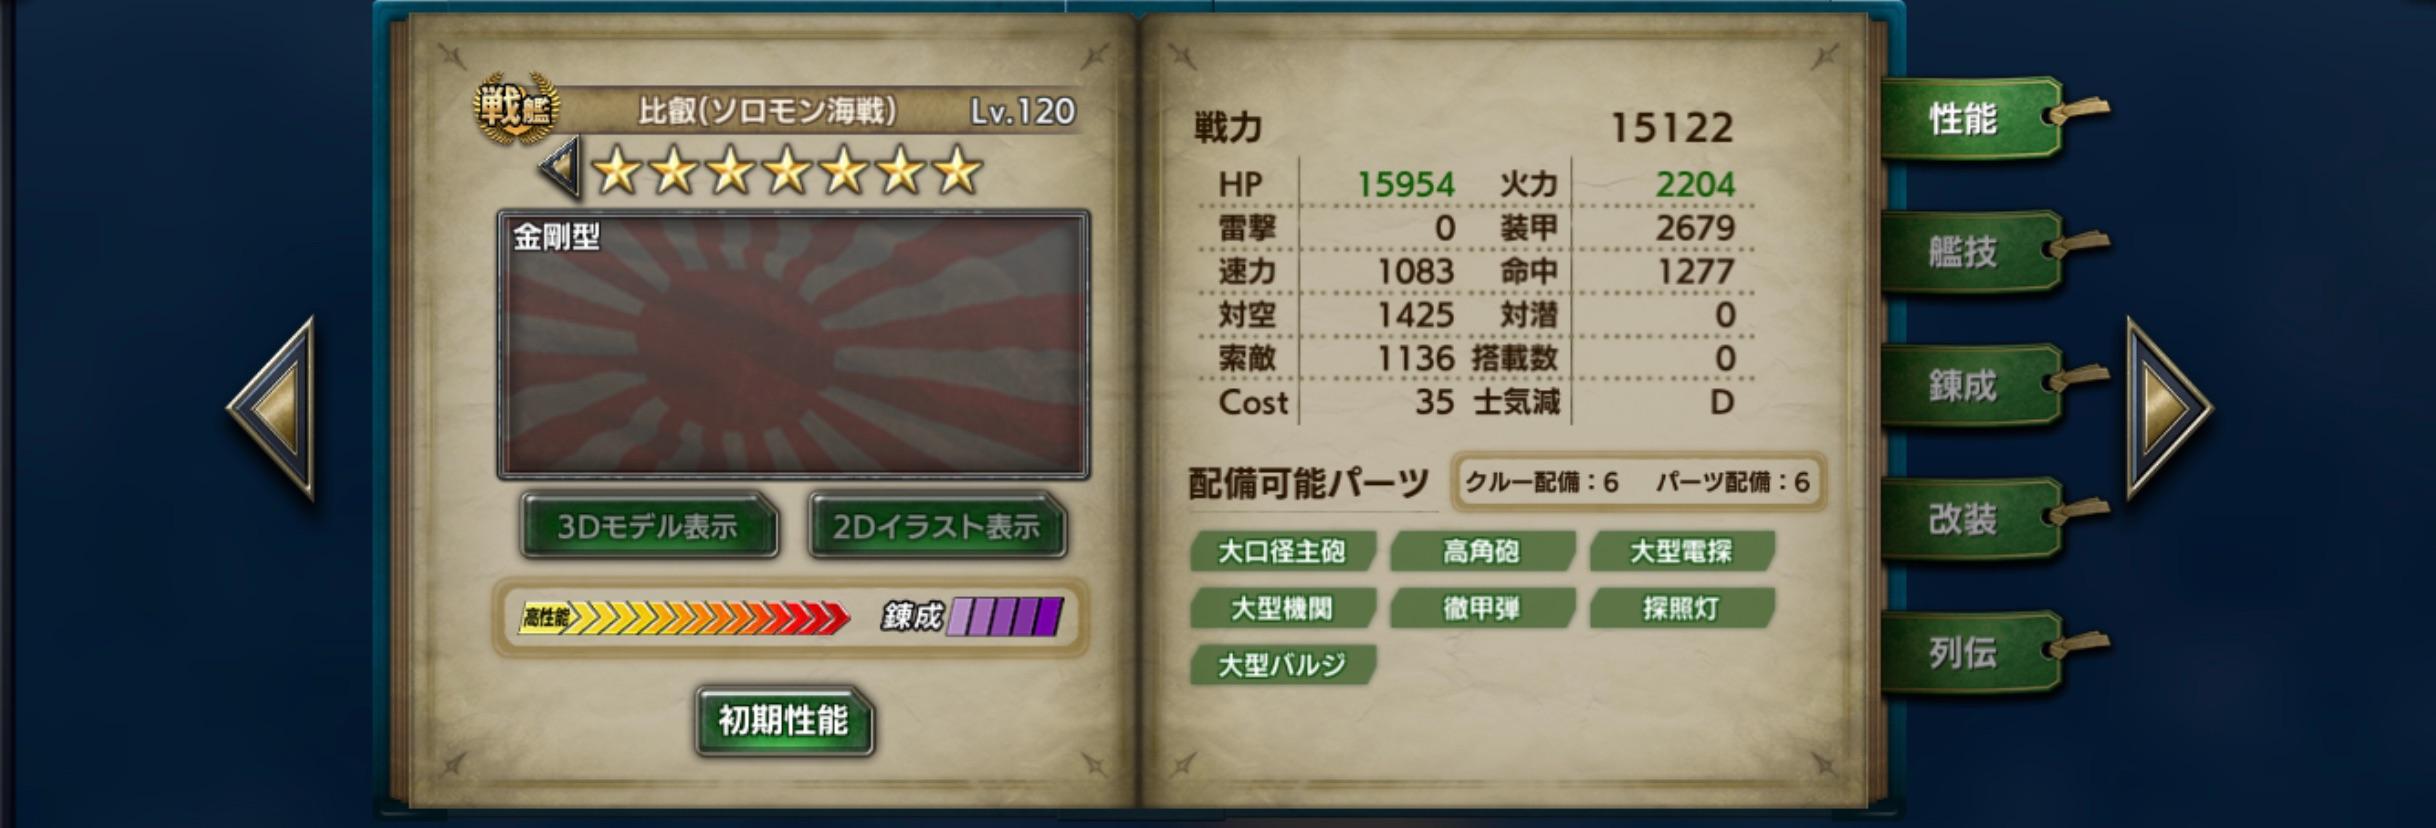 HieiS-performance